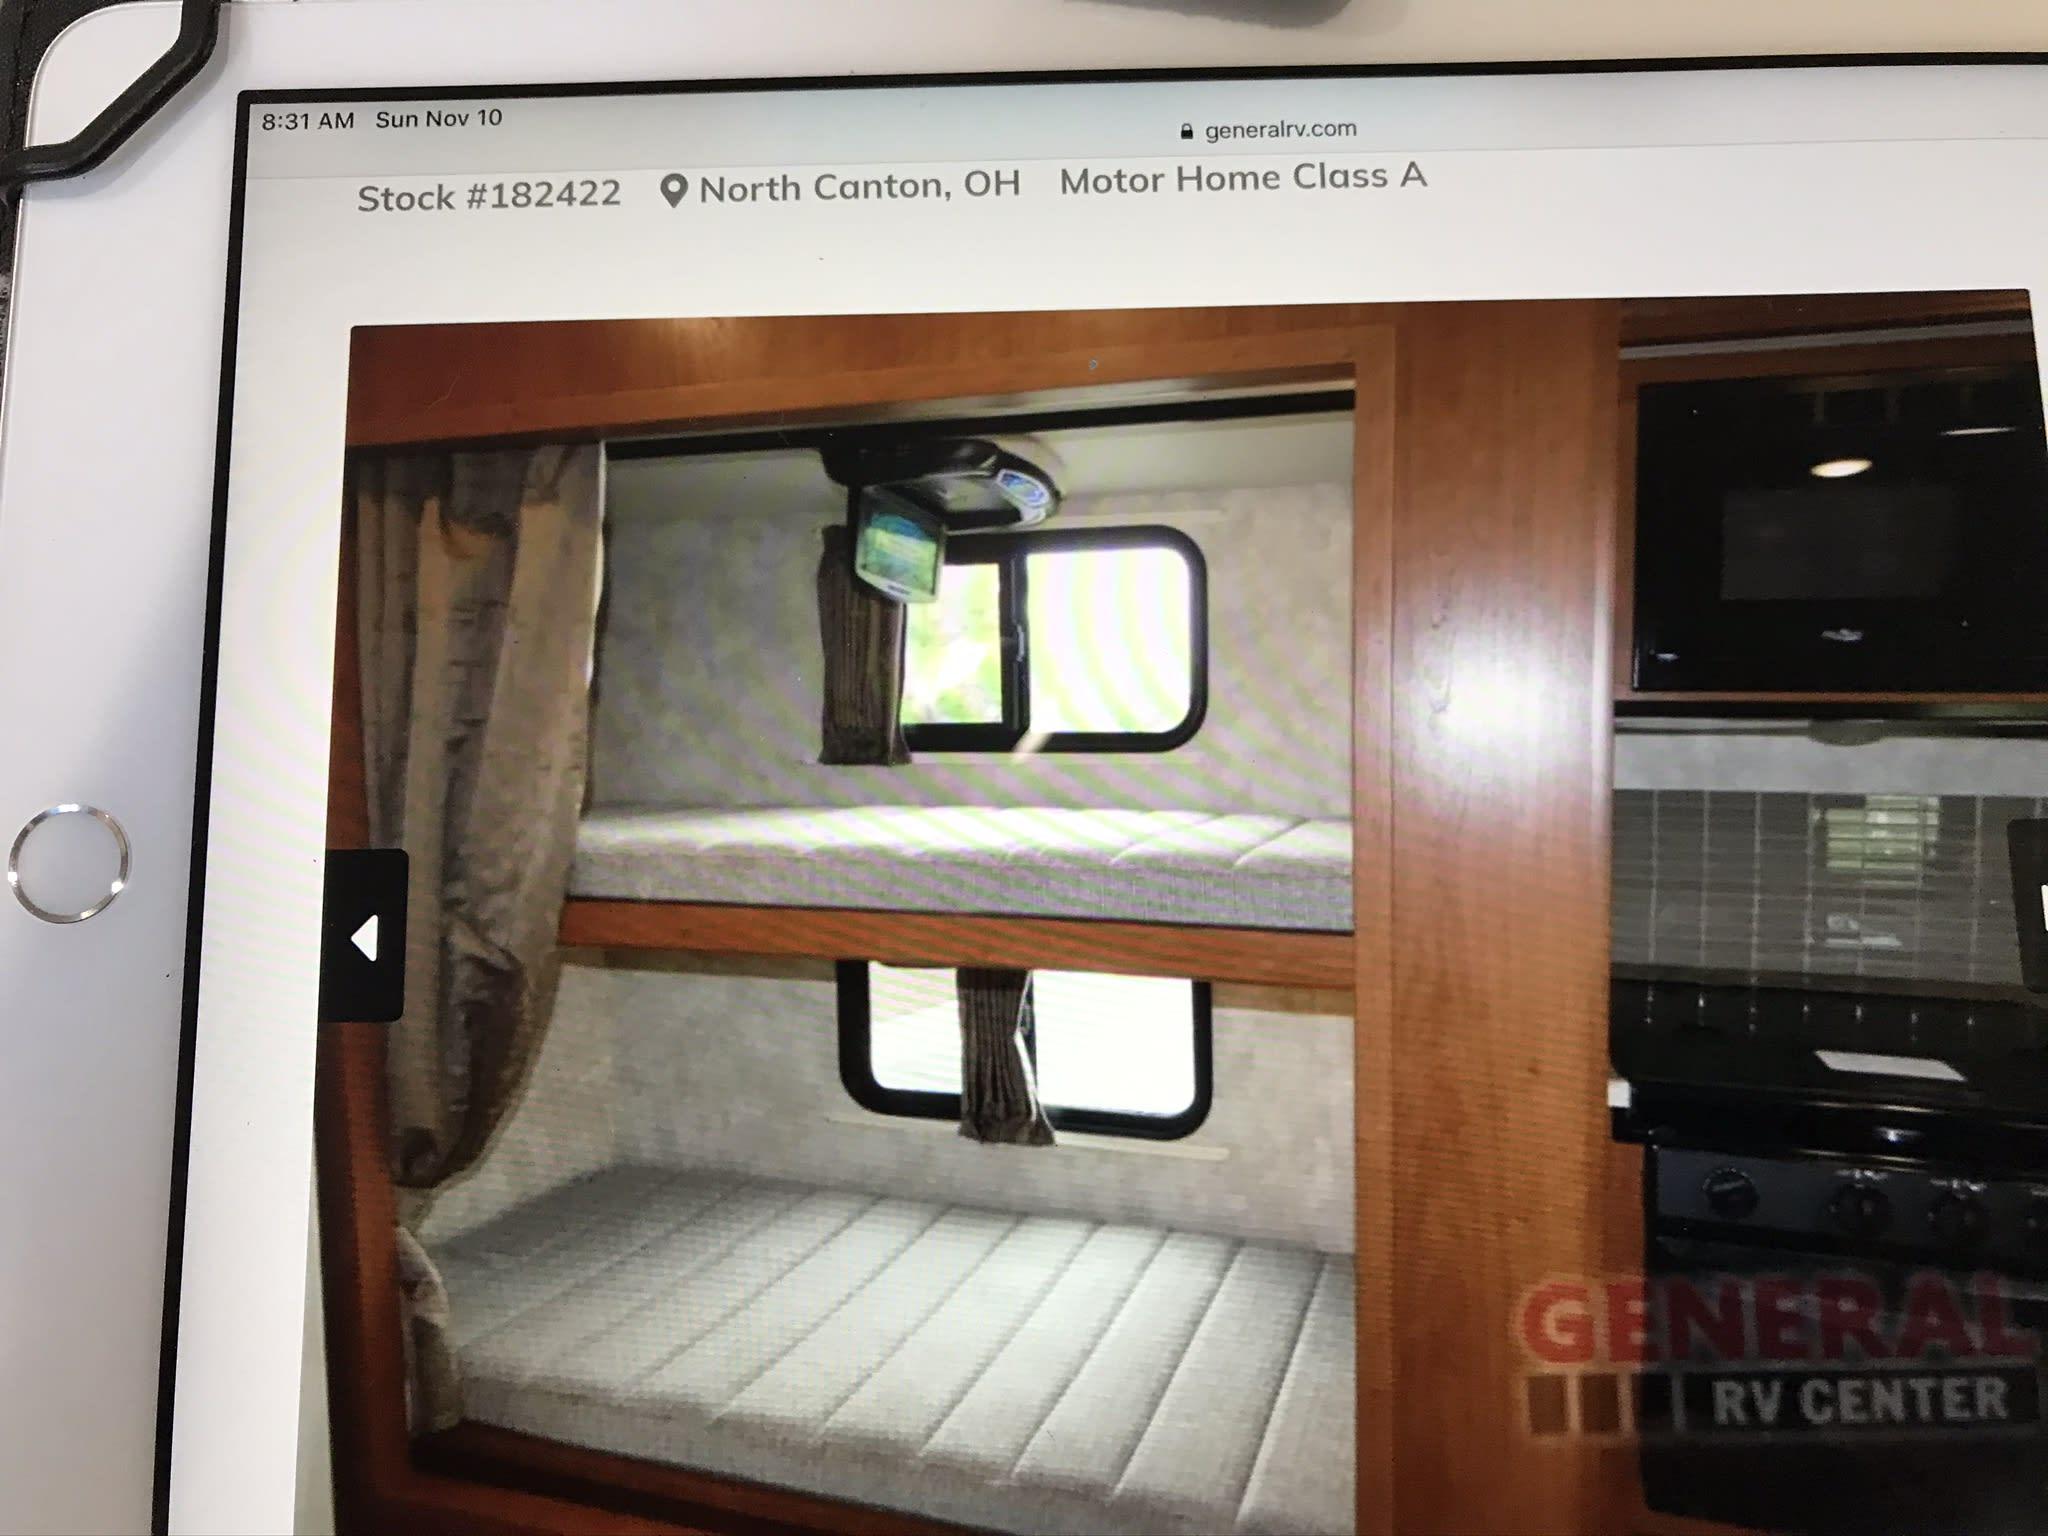 Bunk Beds with DVR/Gaming. Winnebago Vista 2019